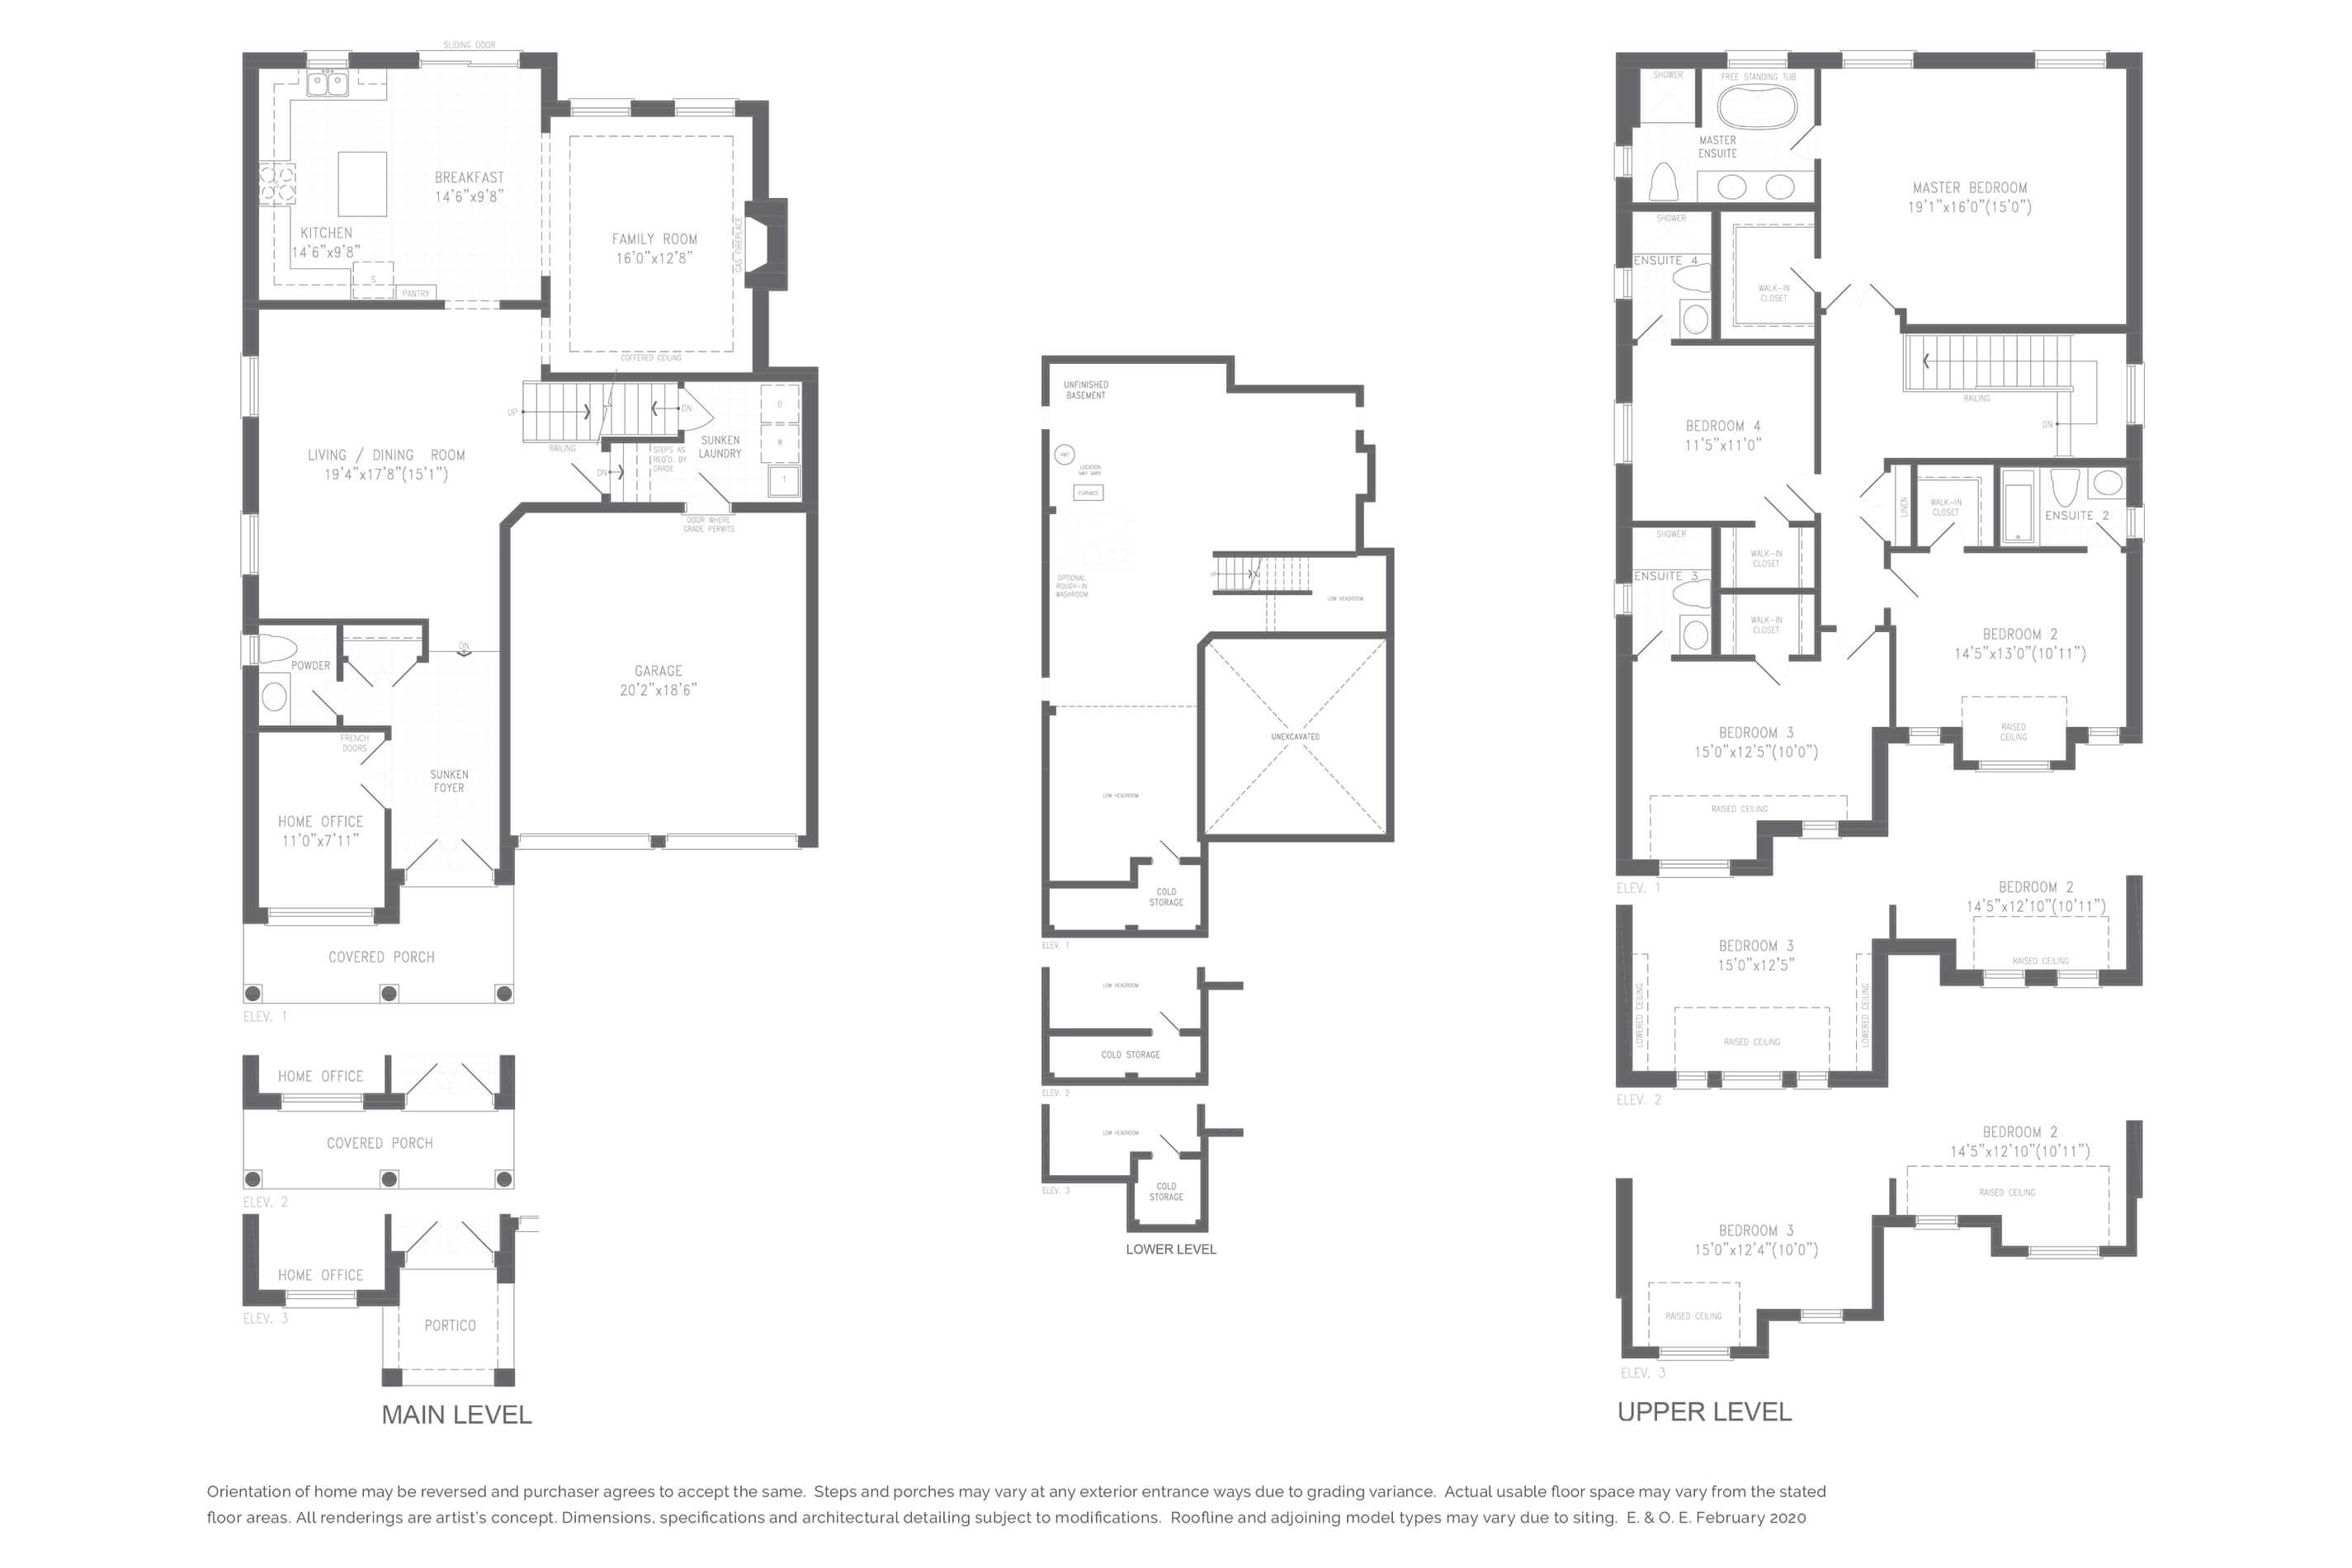 Glenway 3A Floorplan